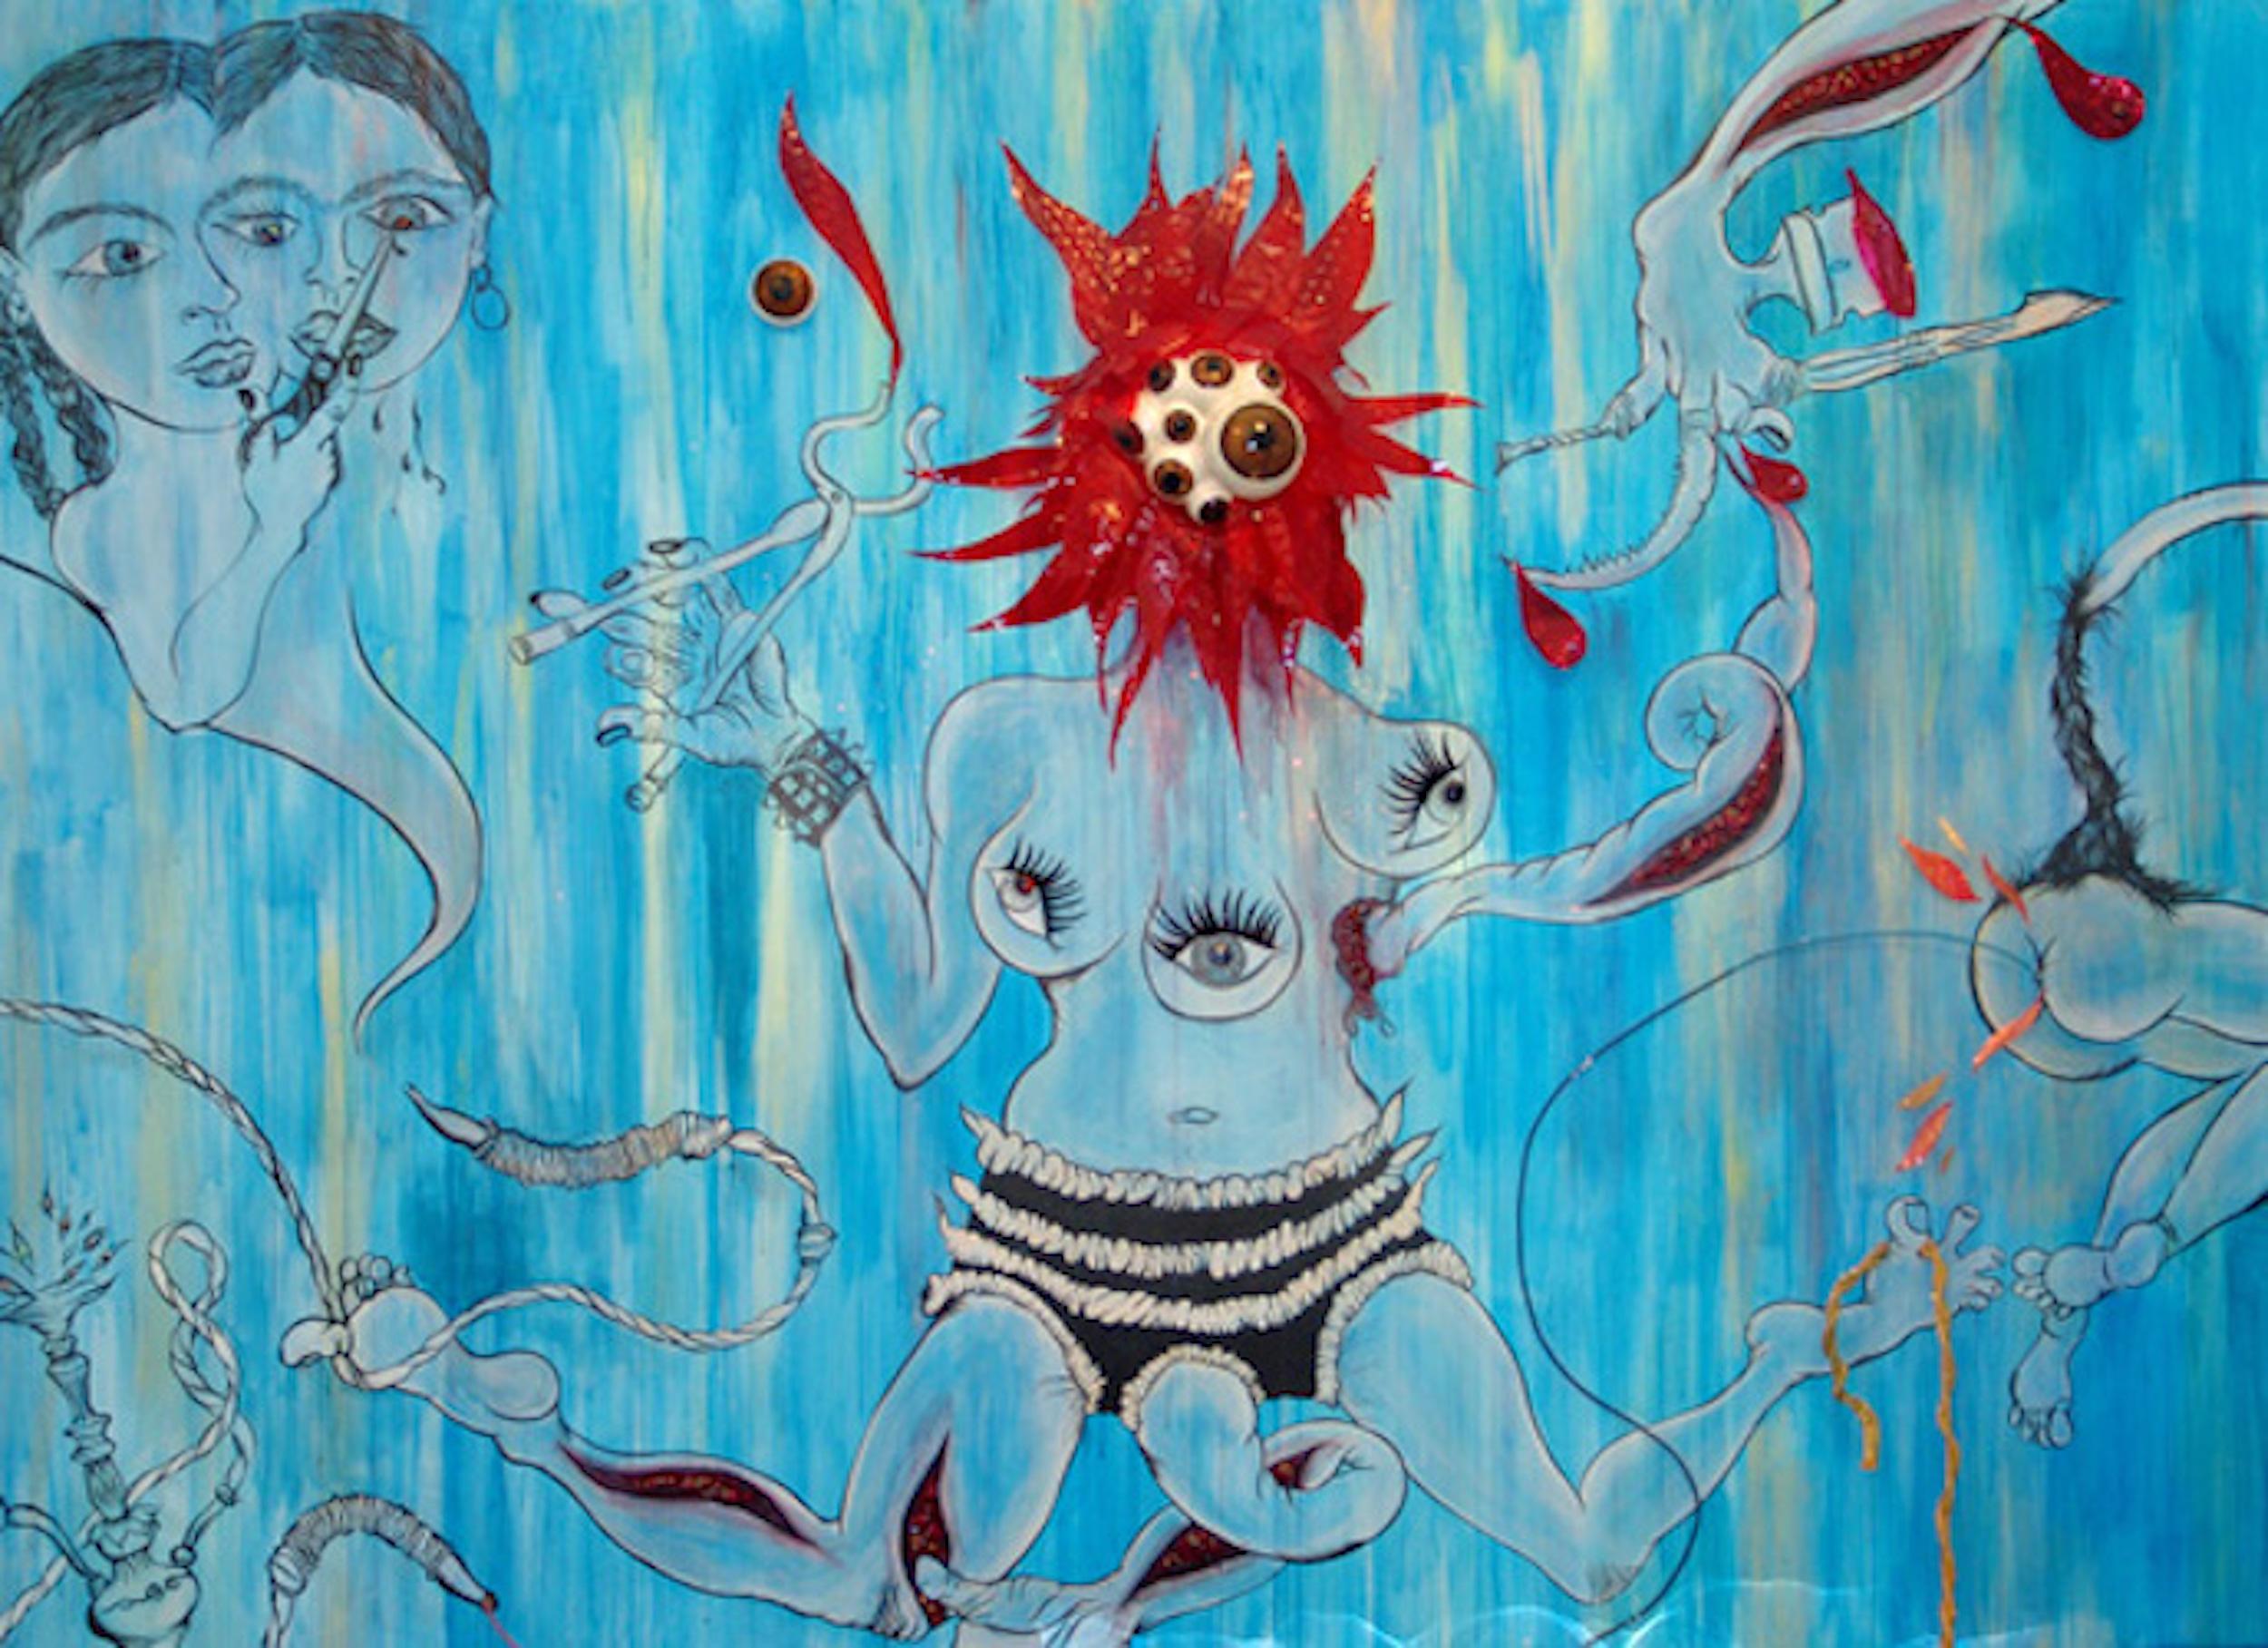 Chitra Ganesh – Upon Her Precipice - Installation view (detail).